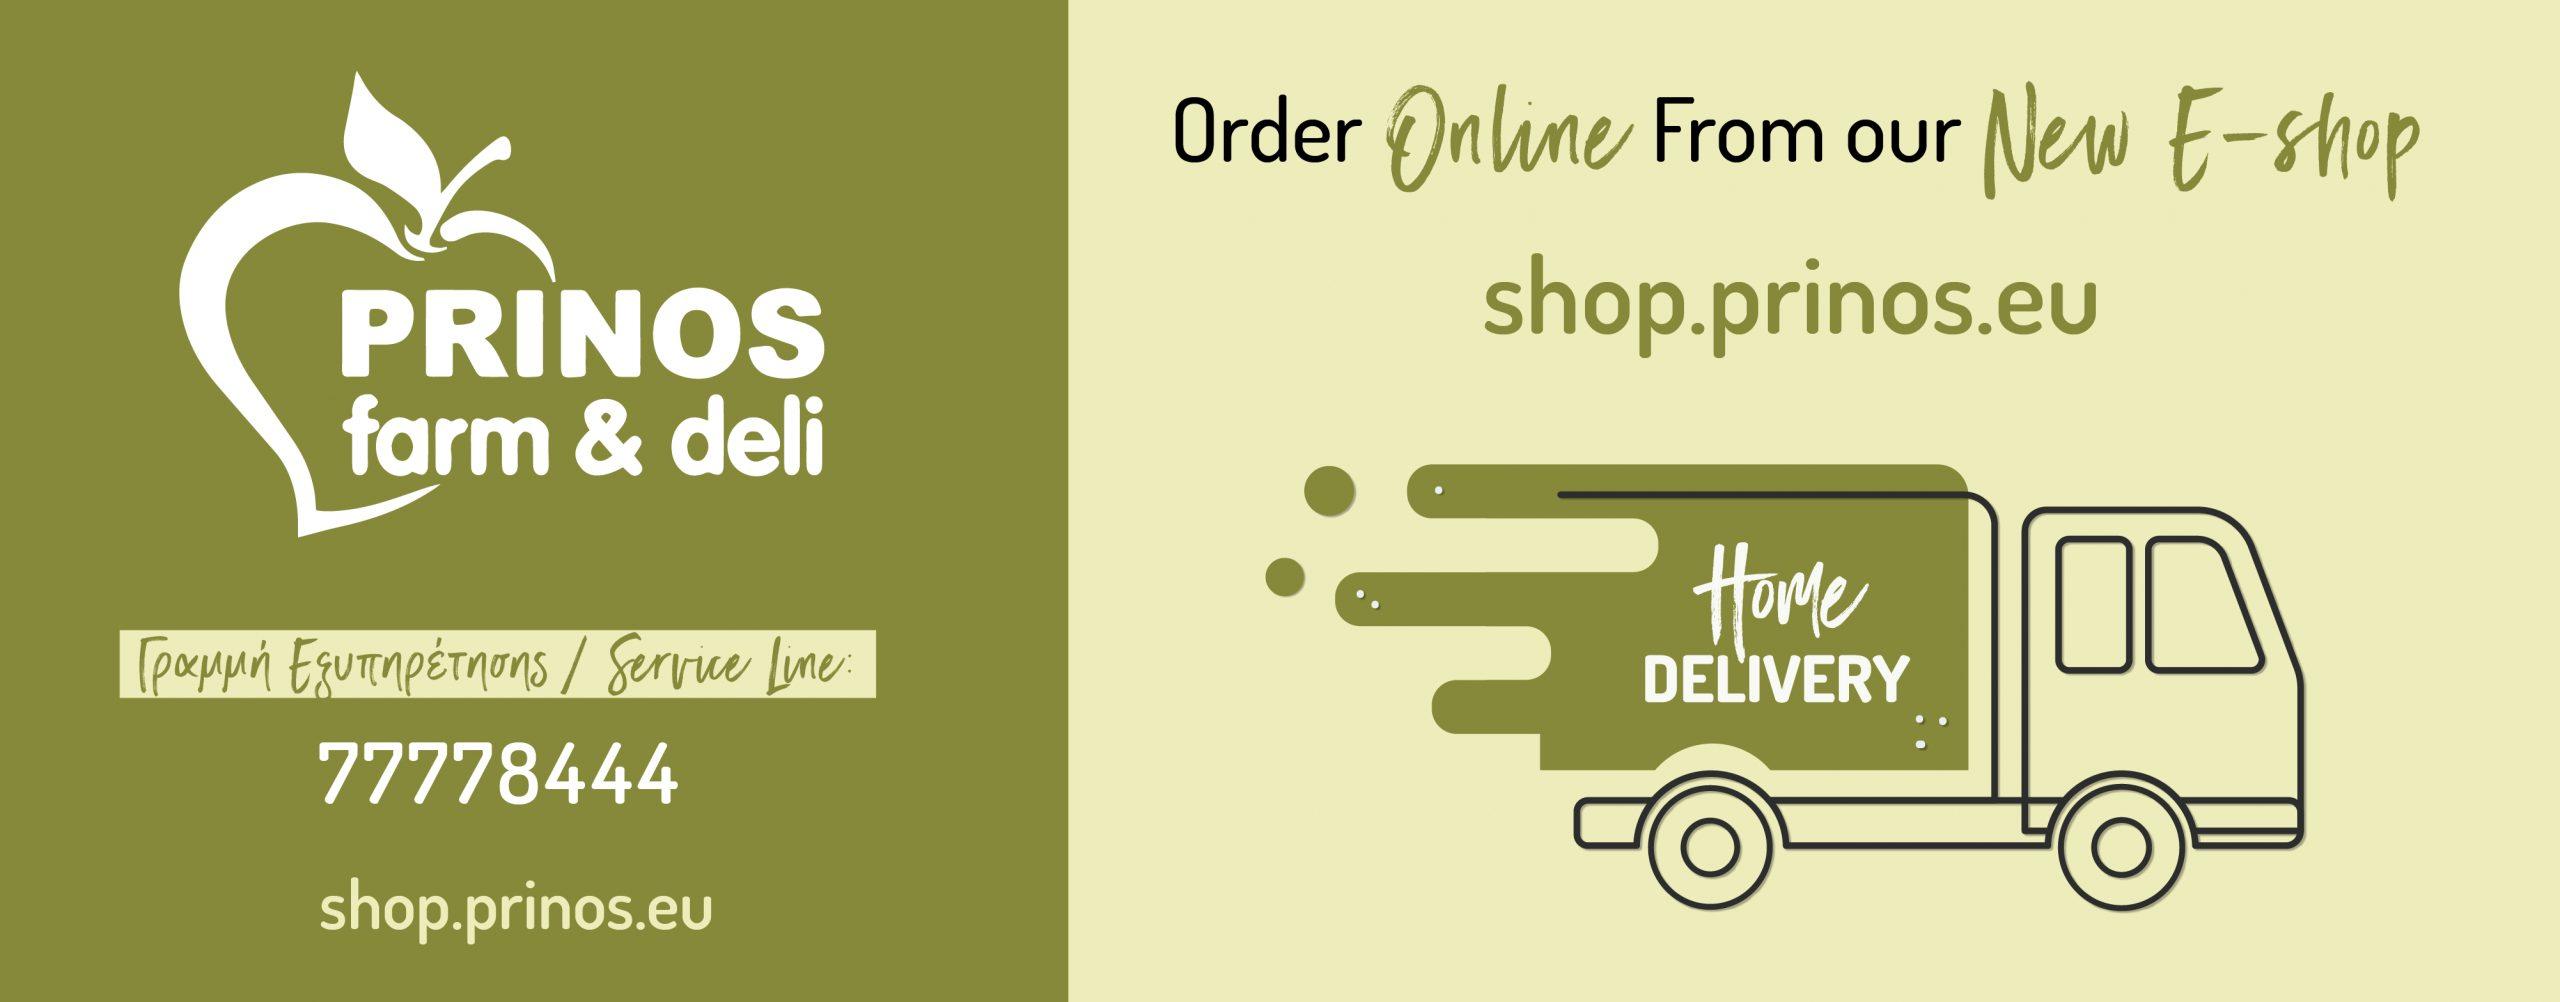 Prinos Home Delivery / Store Pickup – Υπηρεσία κατοίκων διανομής από τον Prino Farm & Deli σε Λάρνακα και Λευκωσία.